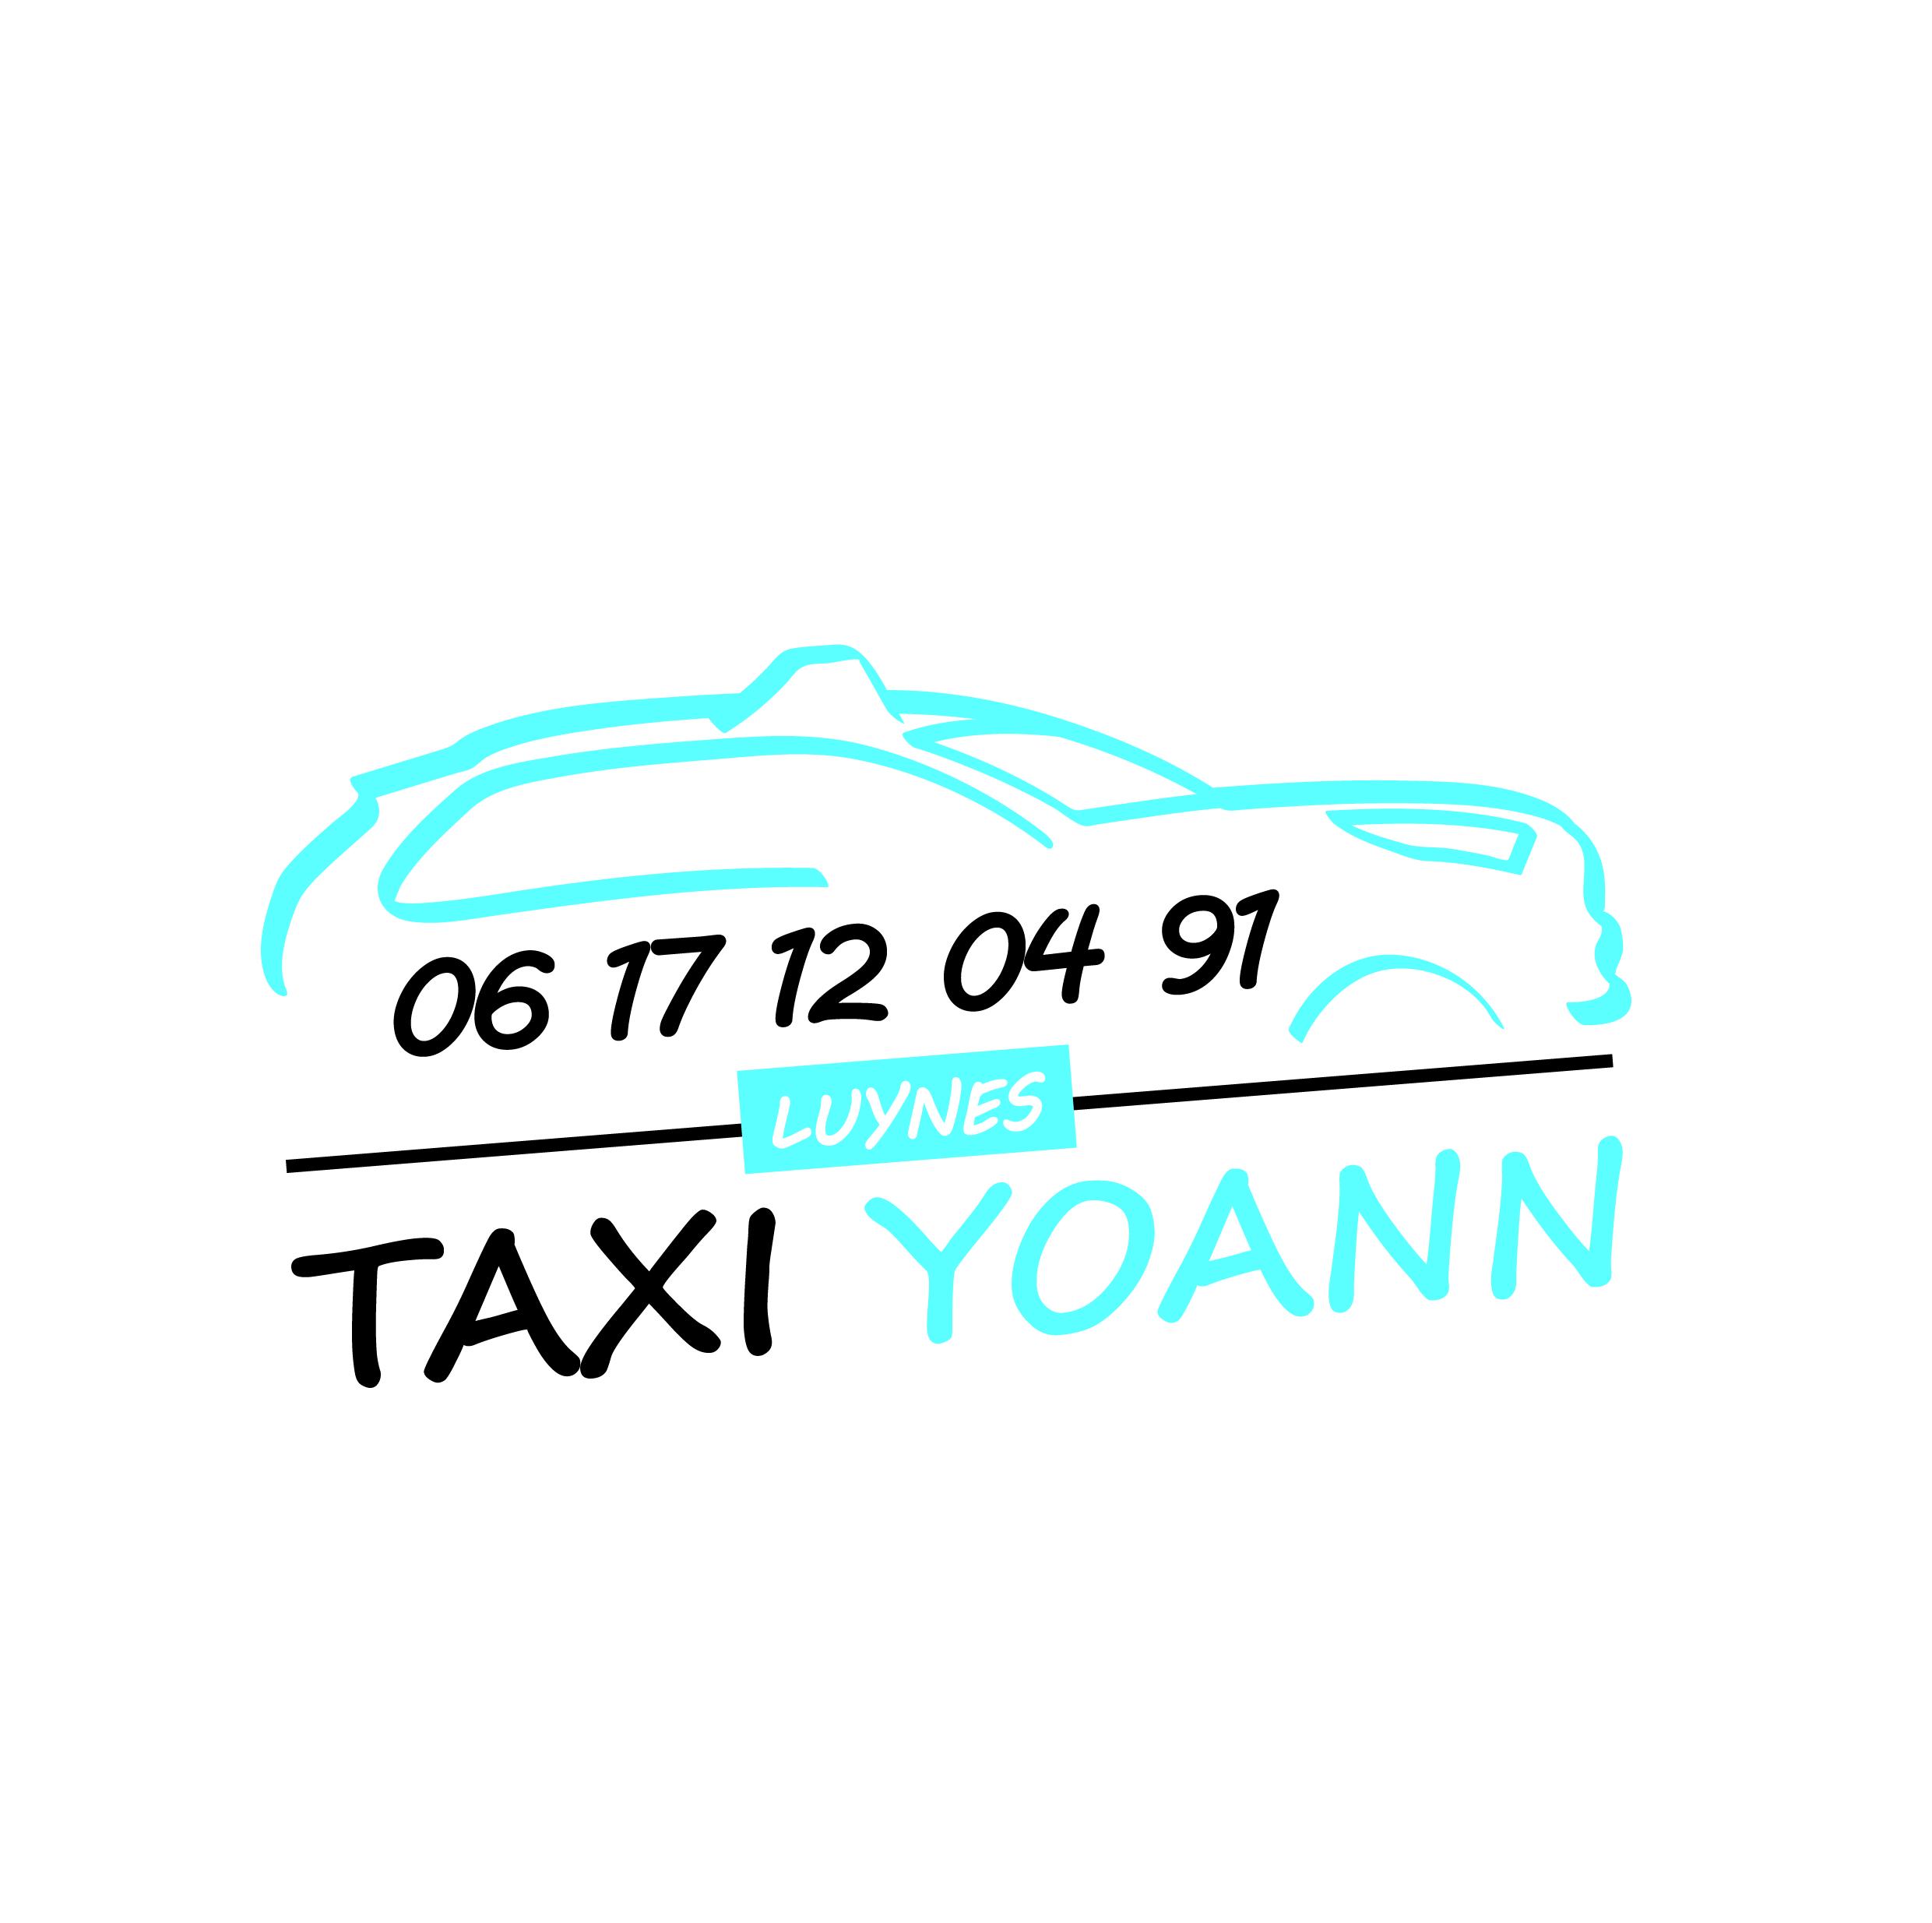 TAXI YOANN